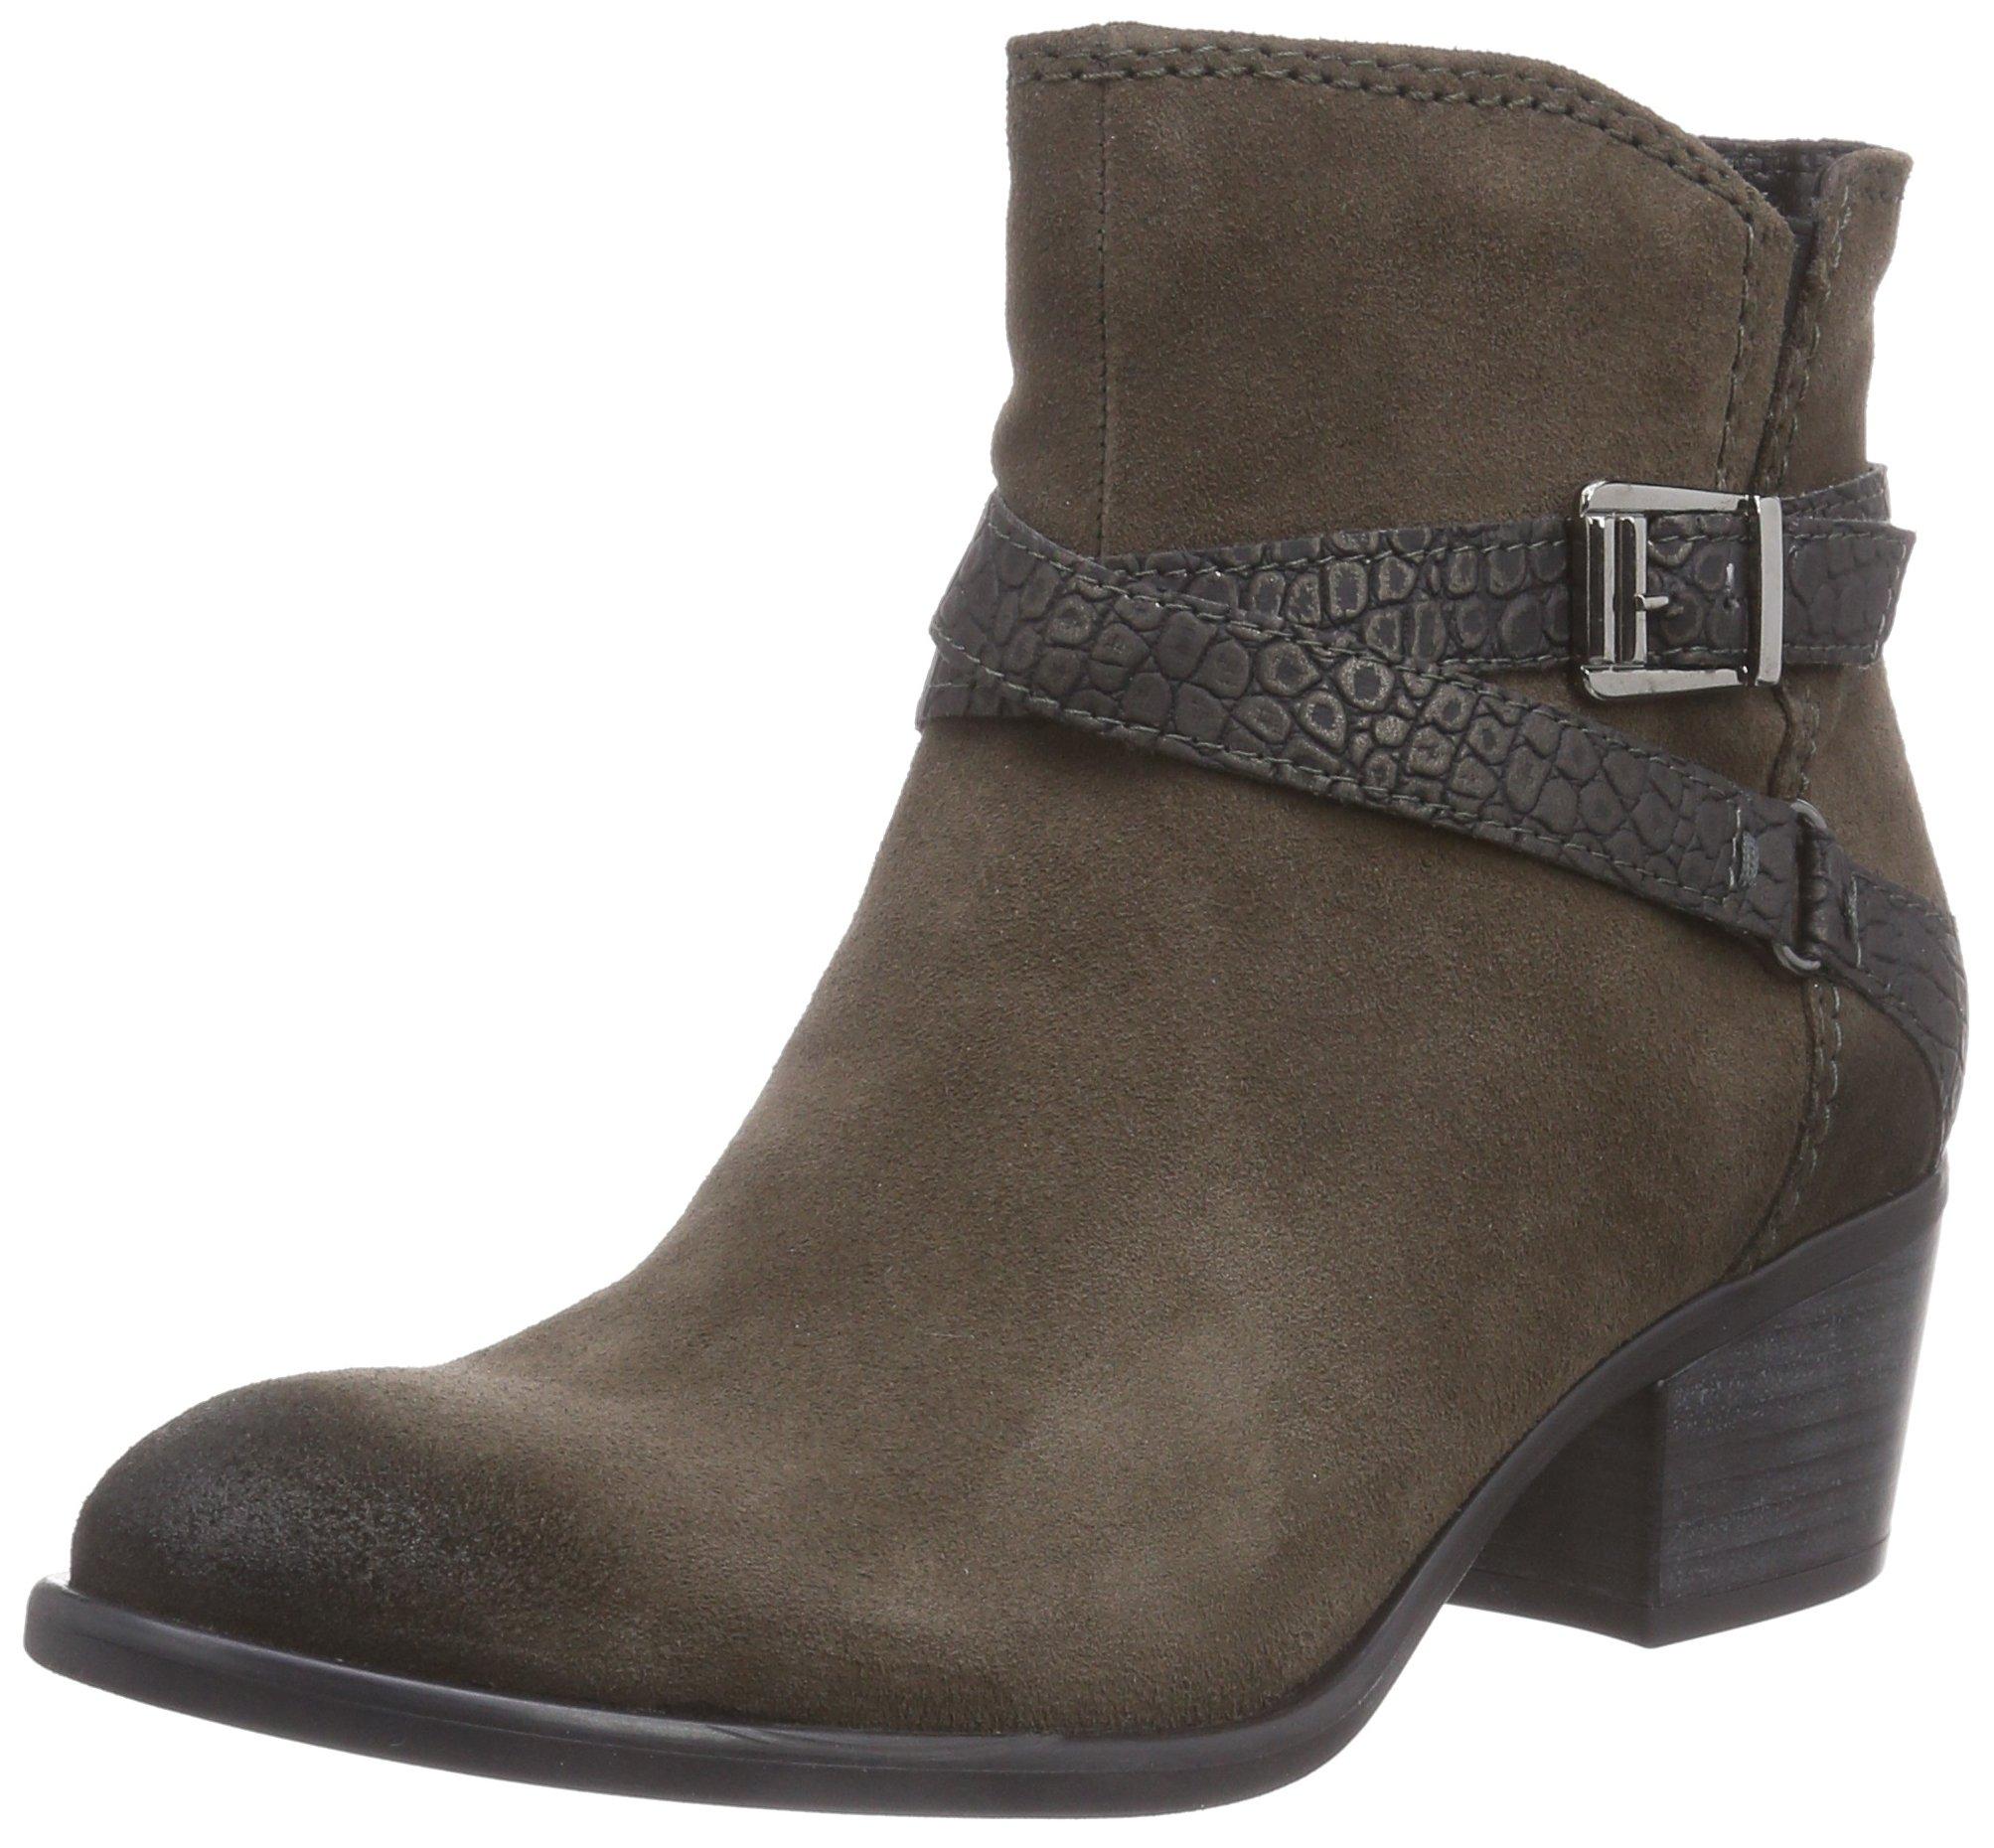 Tamaris Damen 25010 Kurzschaft Stiefel, Mehrfarbig (AsphSTR.Metal 232), 38 EU